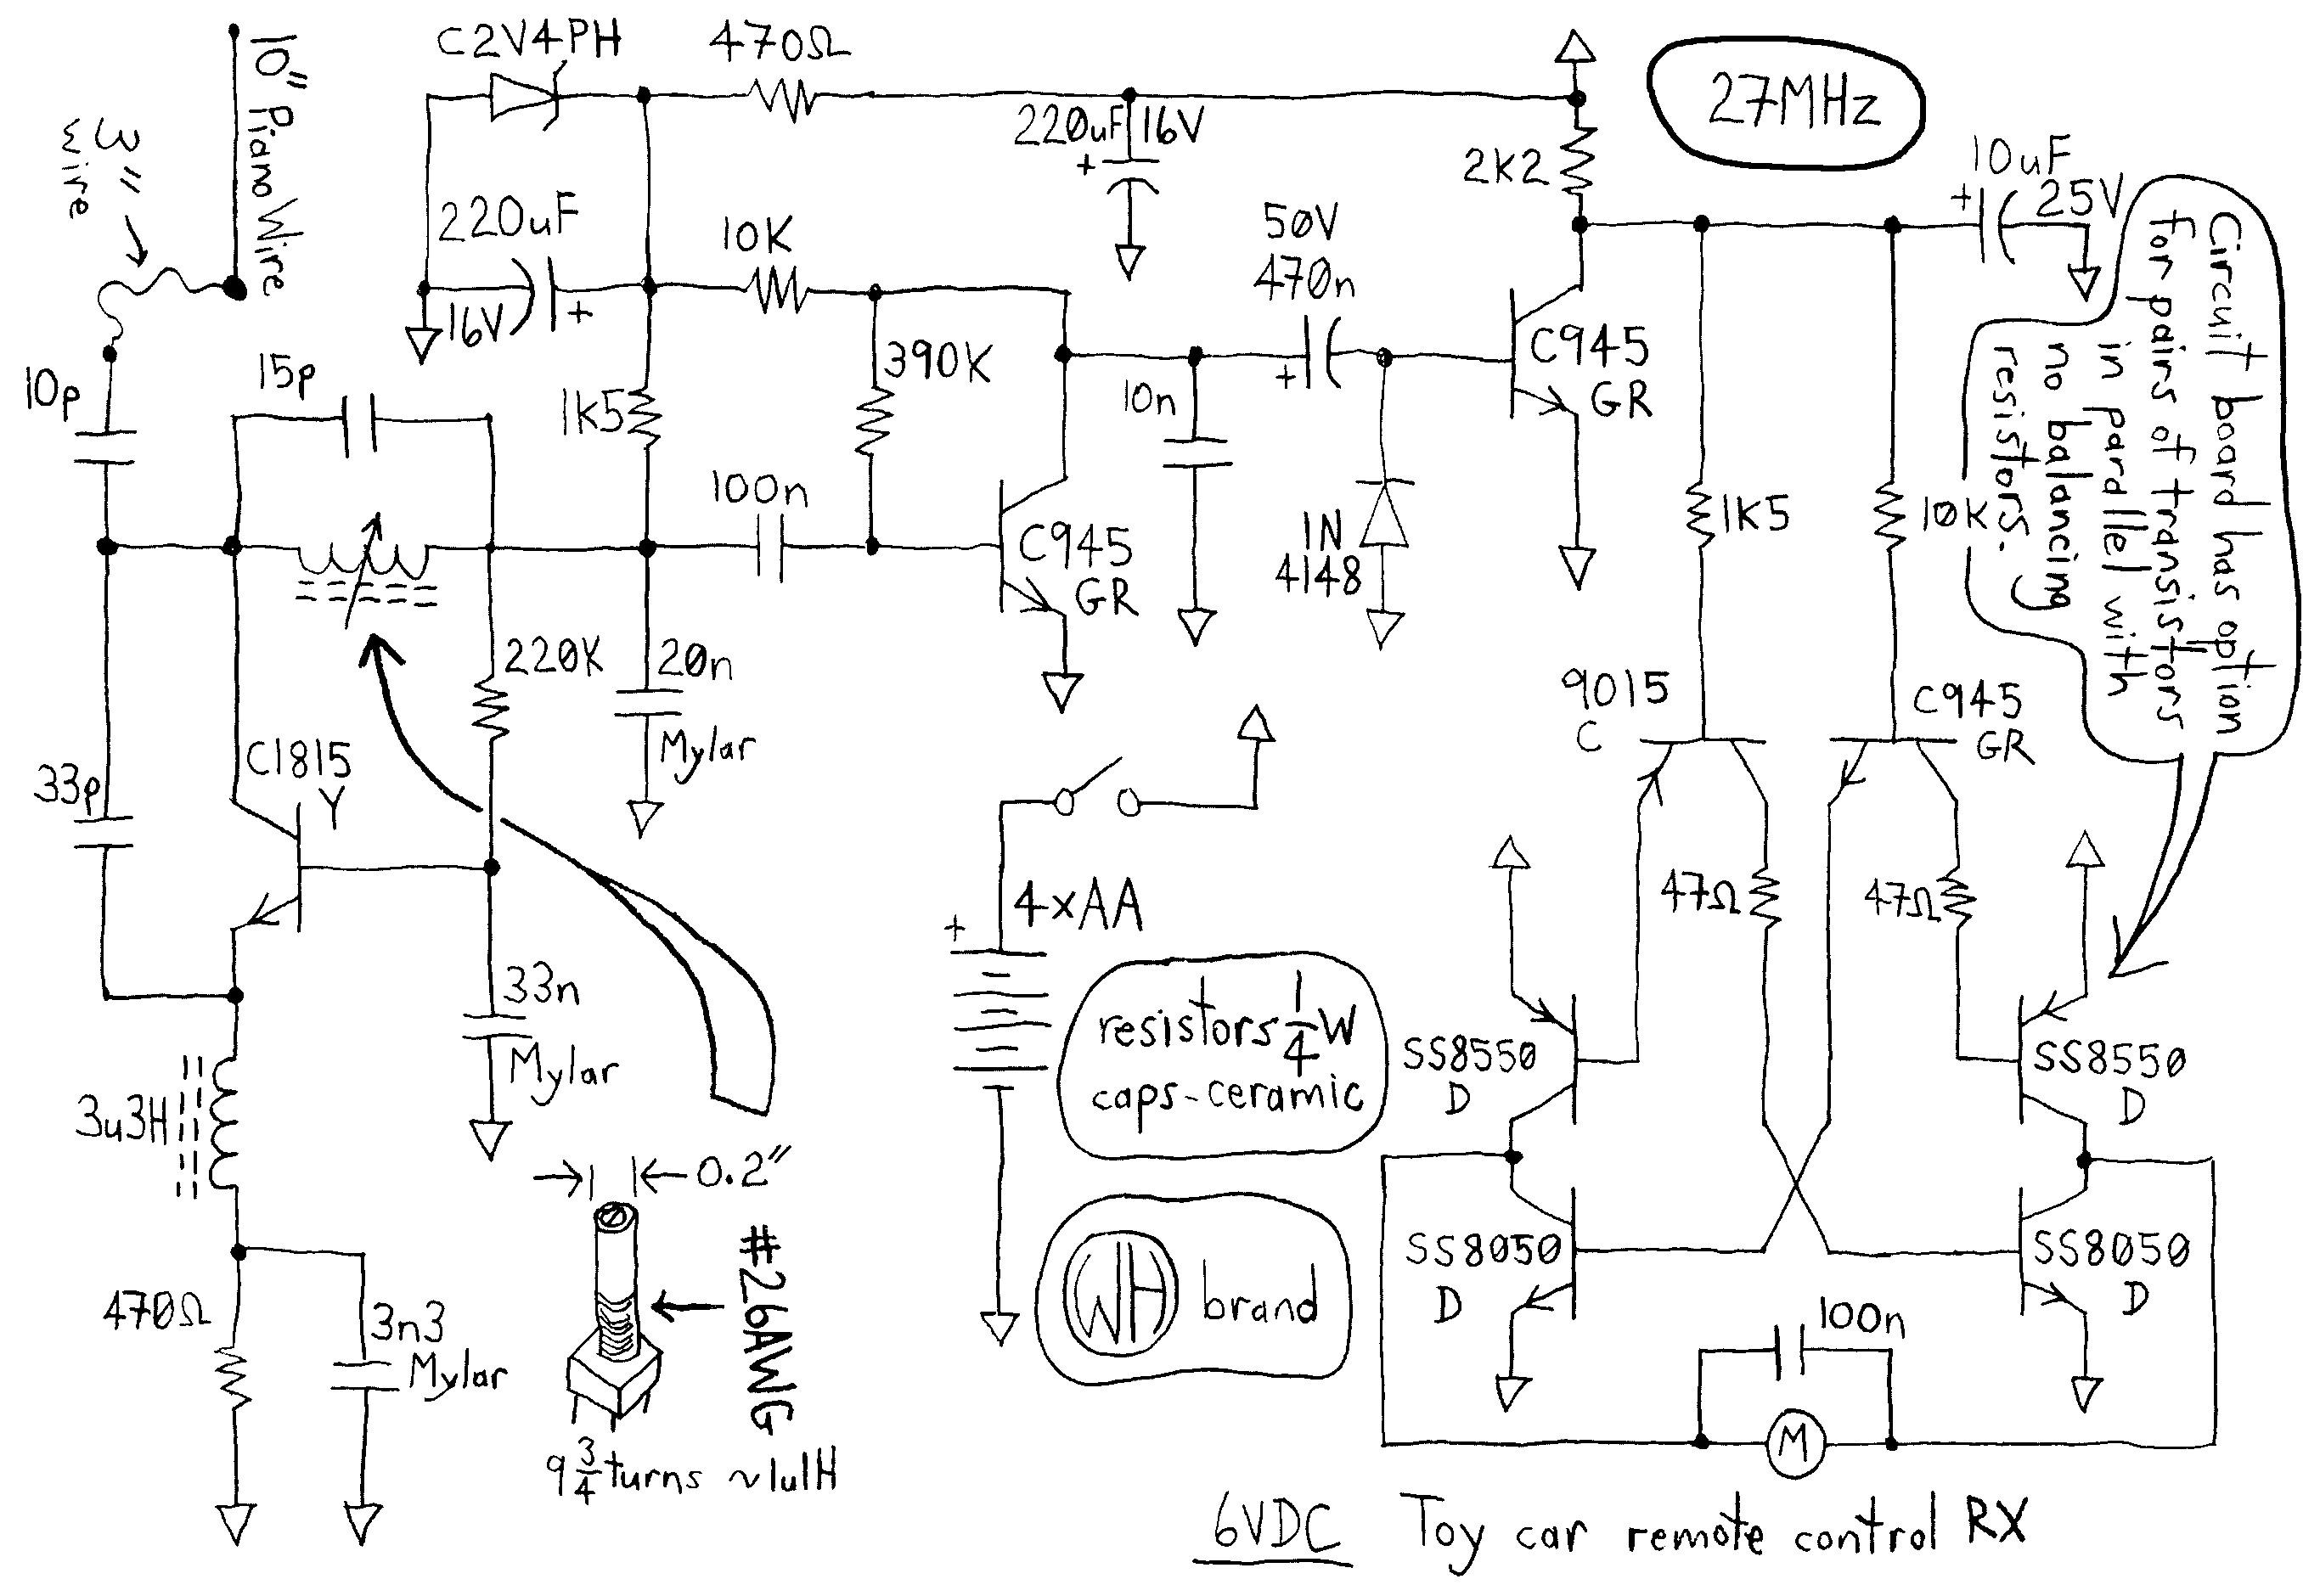 Circuit Diagram Of Remote Control Car Remote Control Car Drawing at Getdrawings Of Circuit Diagram Of Remote Control Car